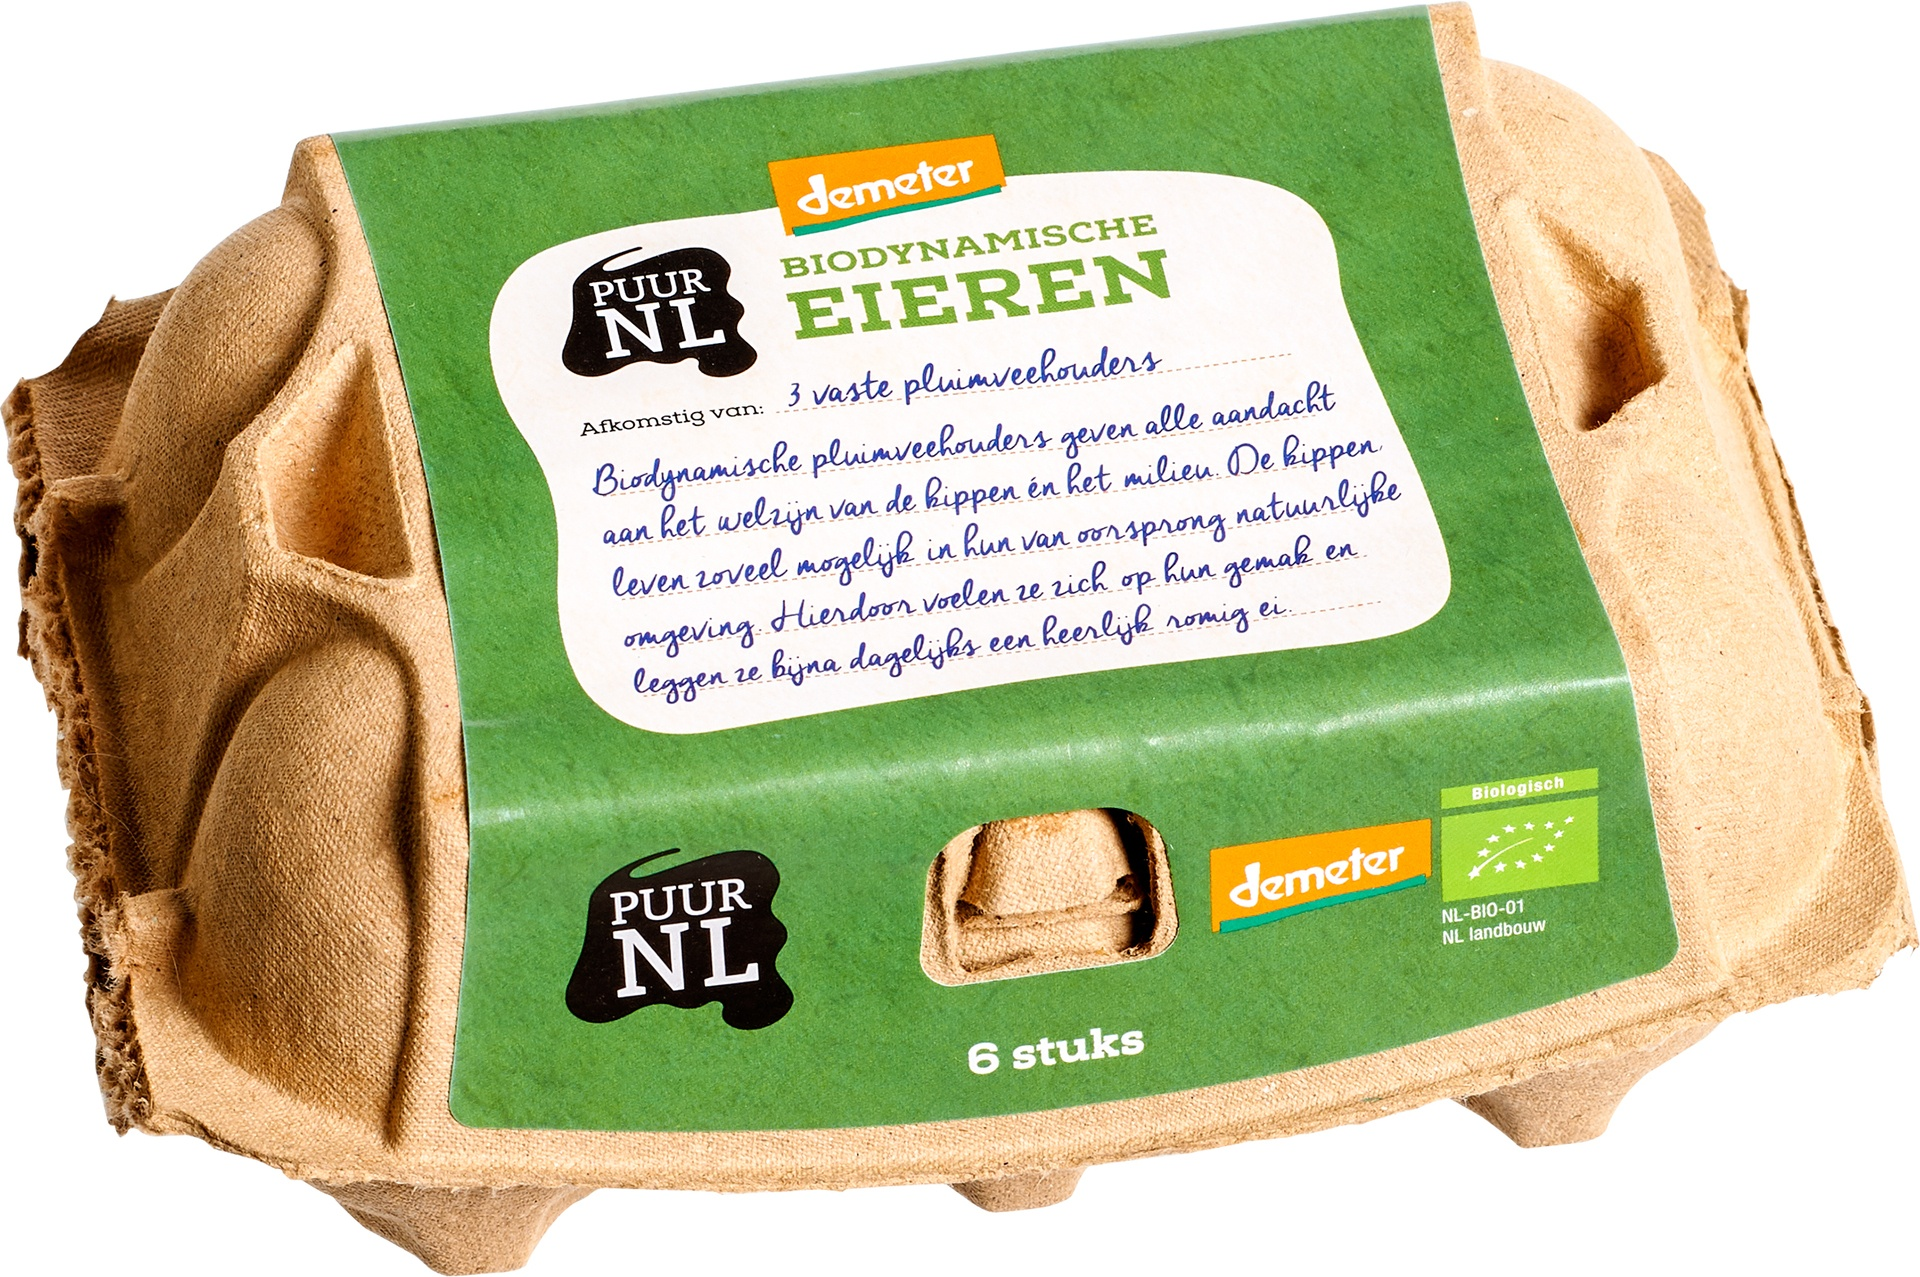 Biologische Puur NL Eieren 6 st